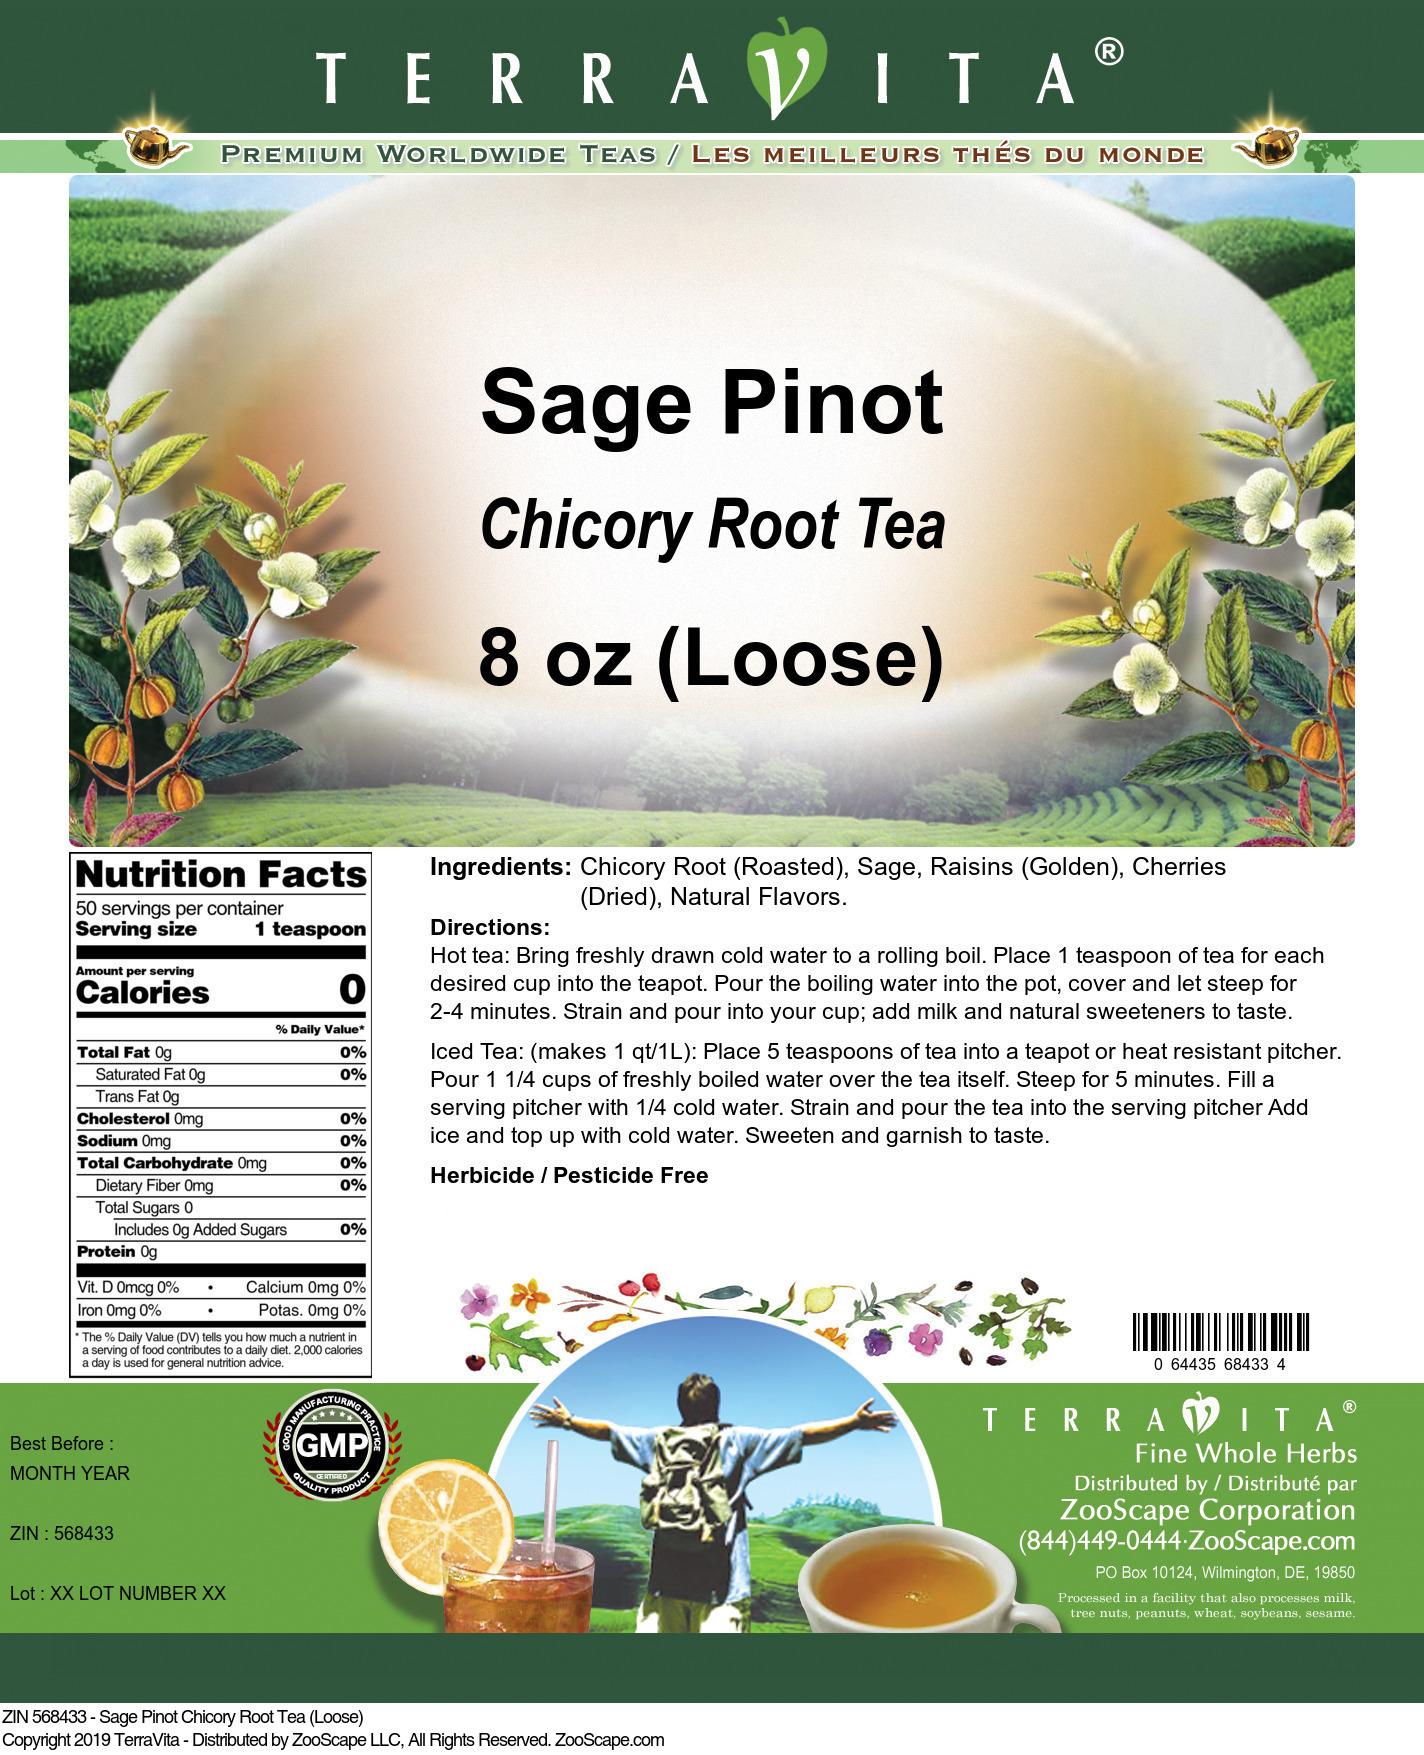 Sage Pinot Chicory Root